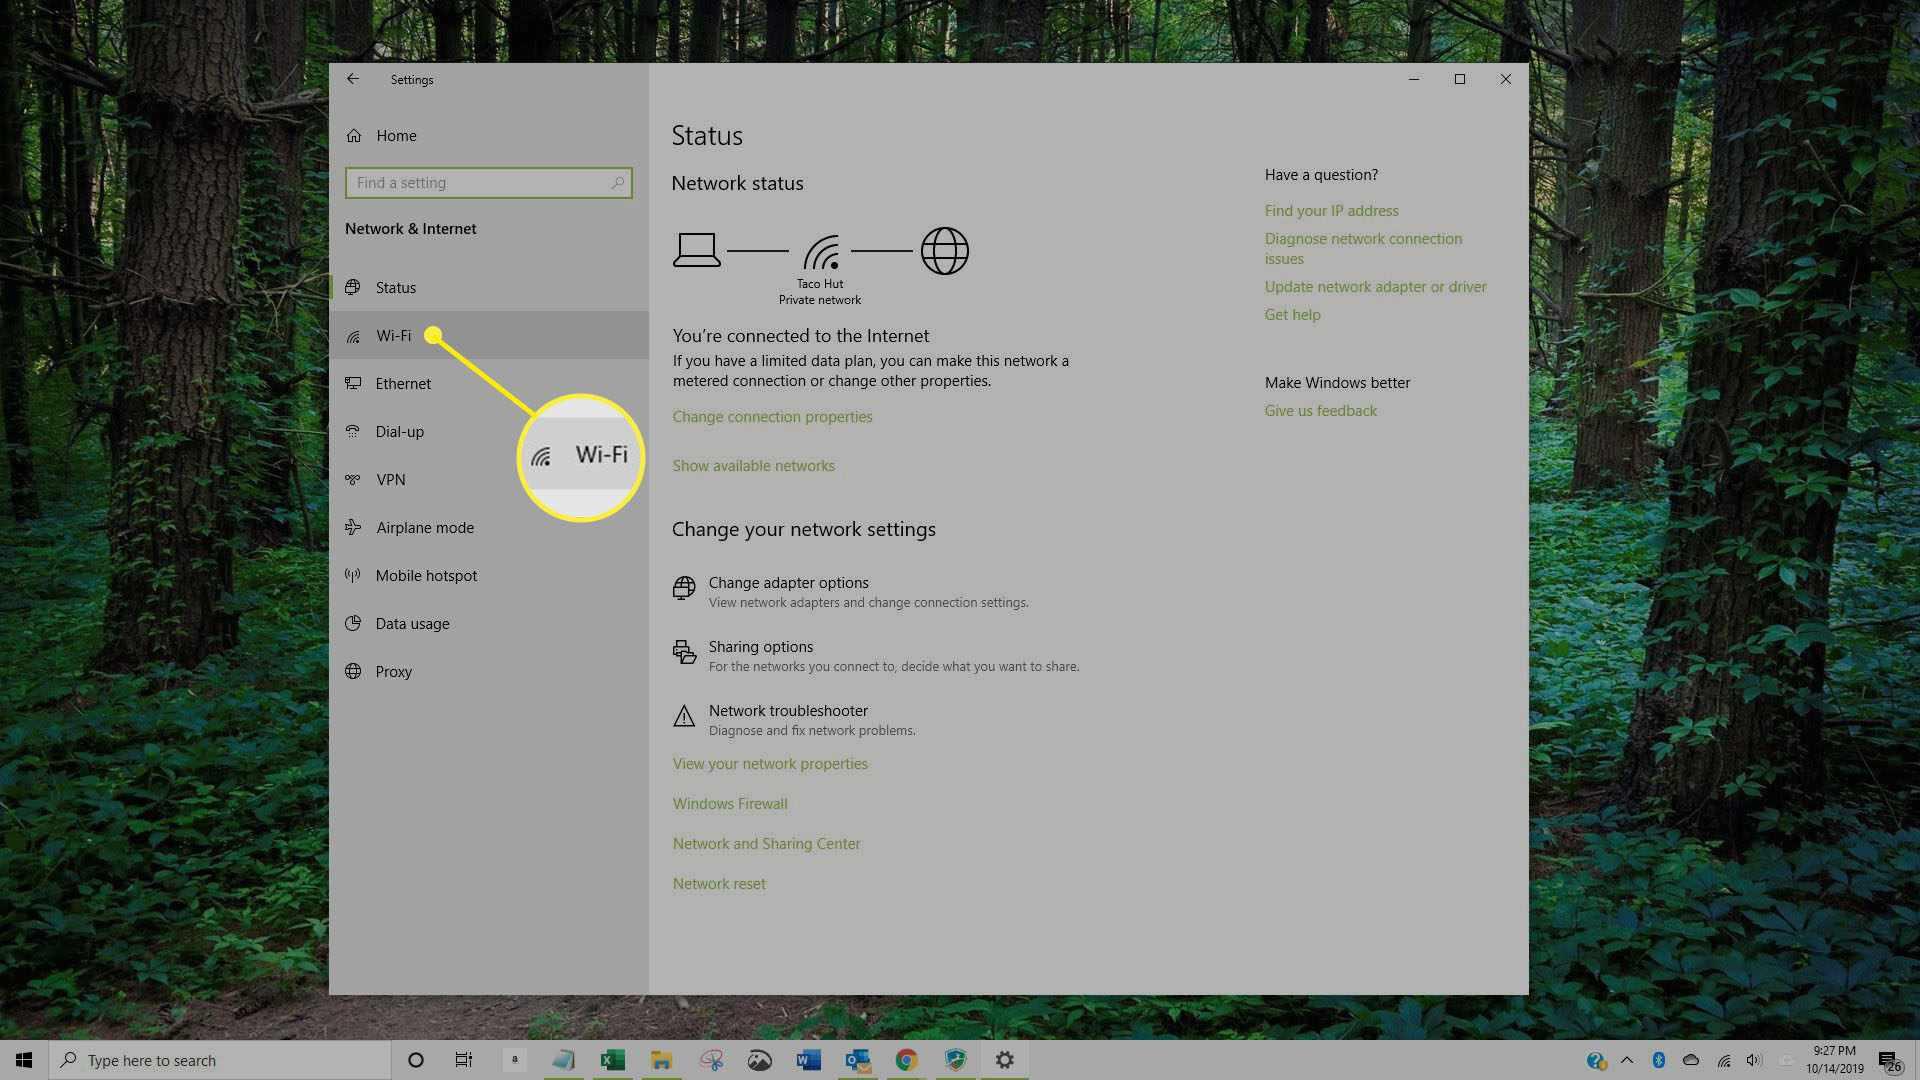 Screenshot of Network & Internet window